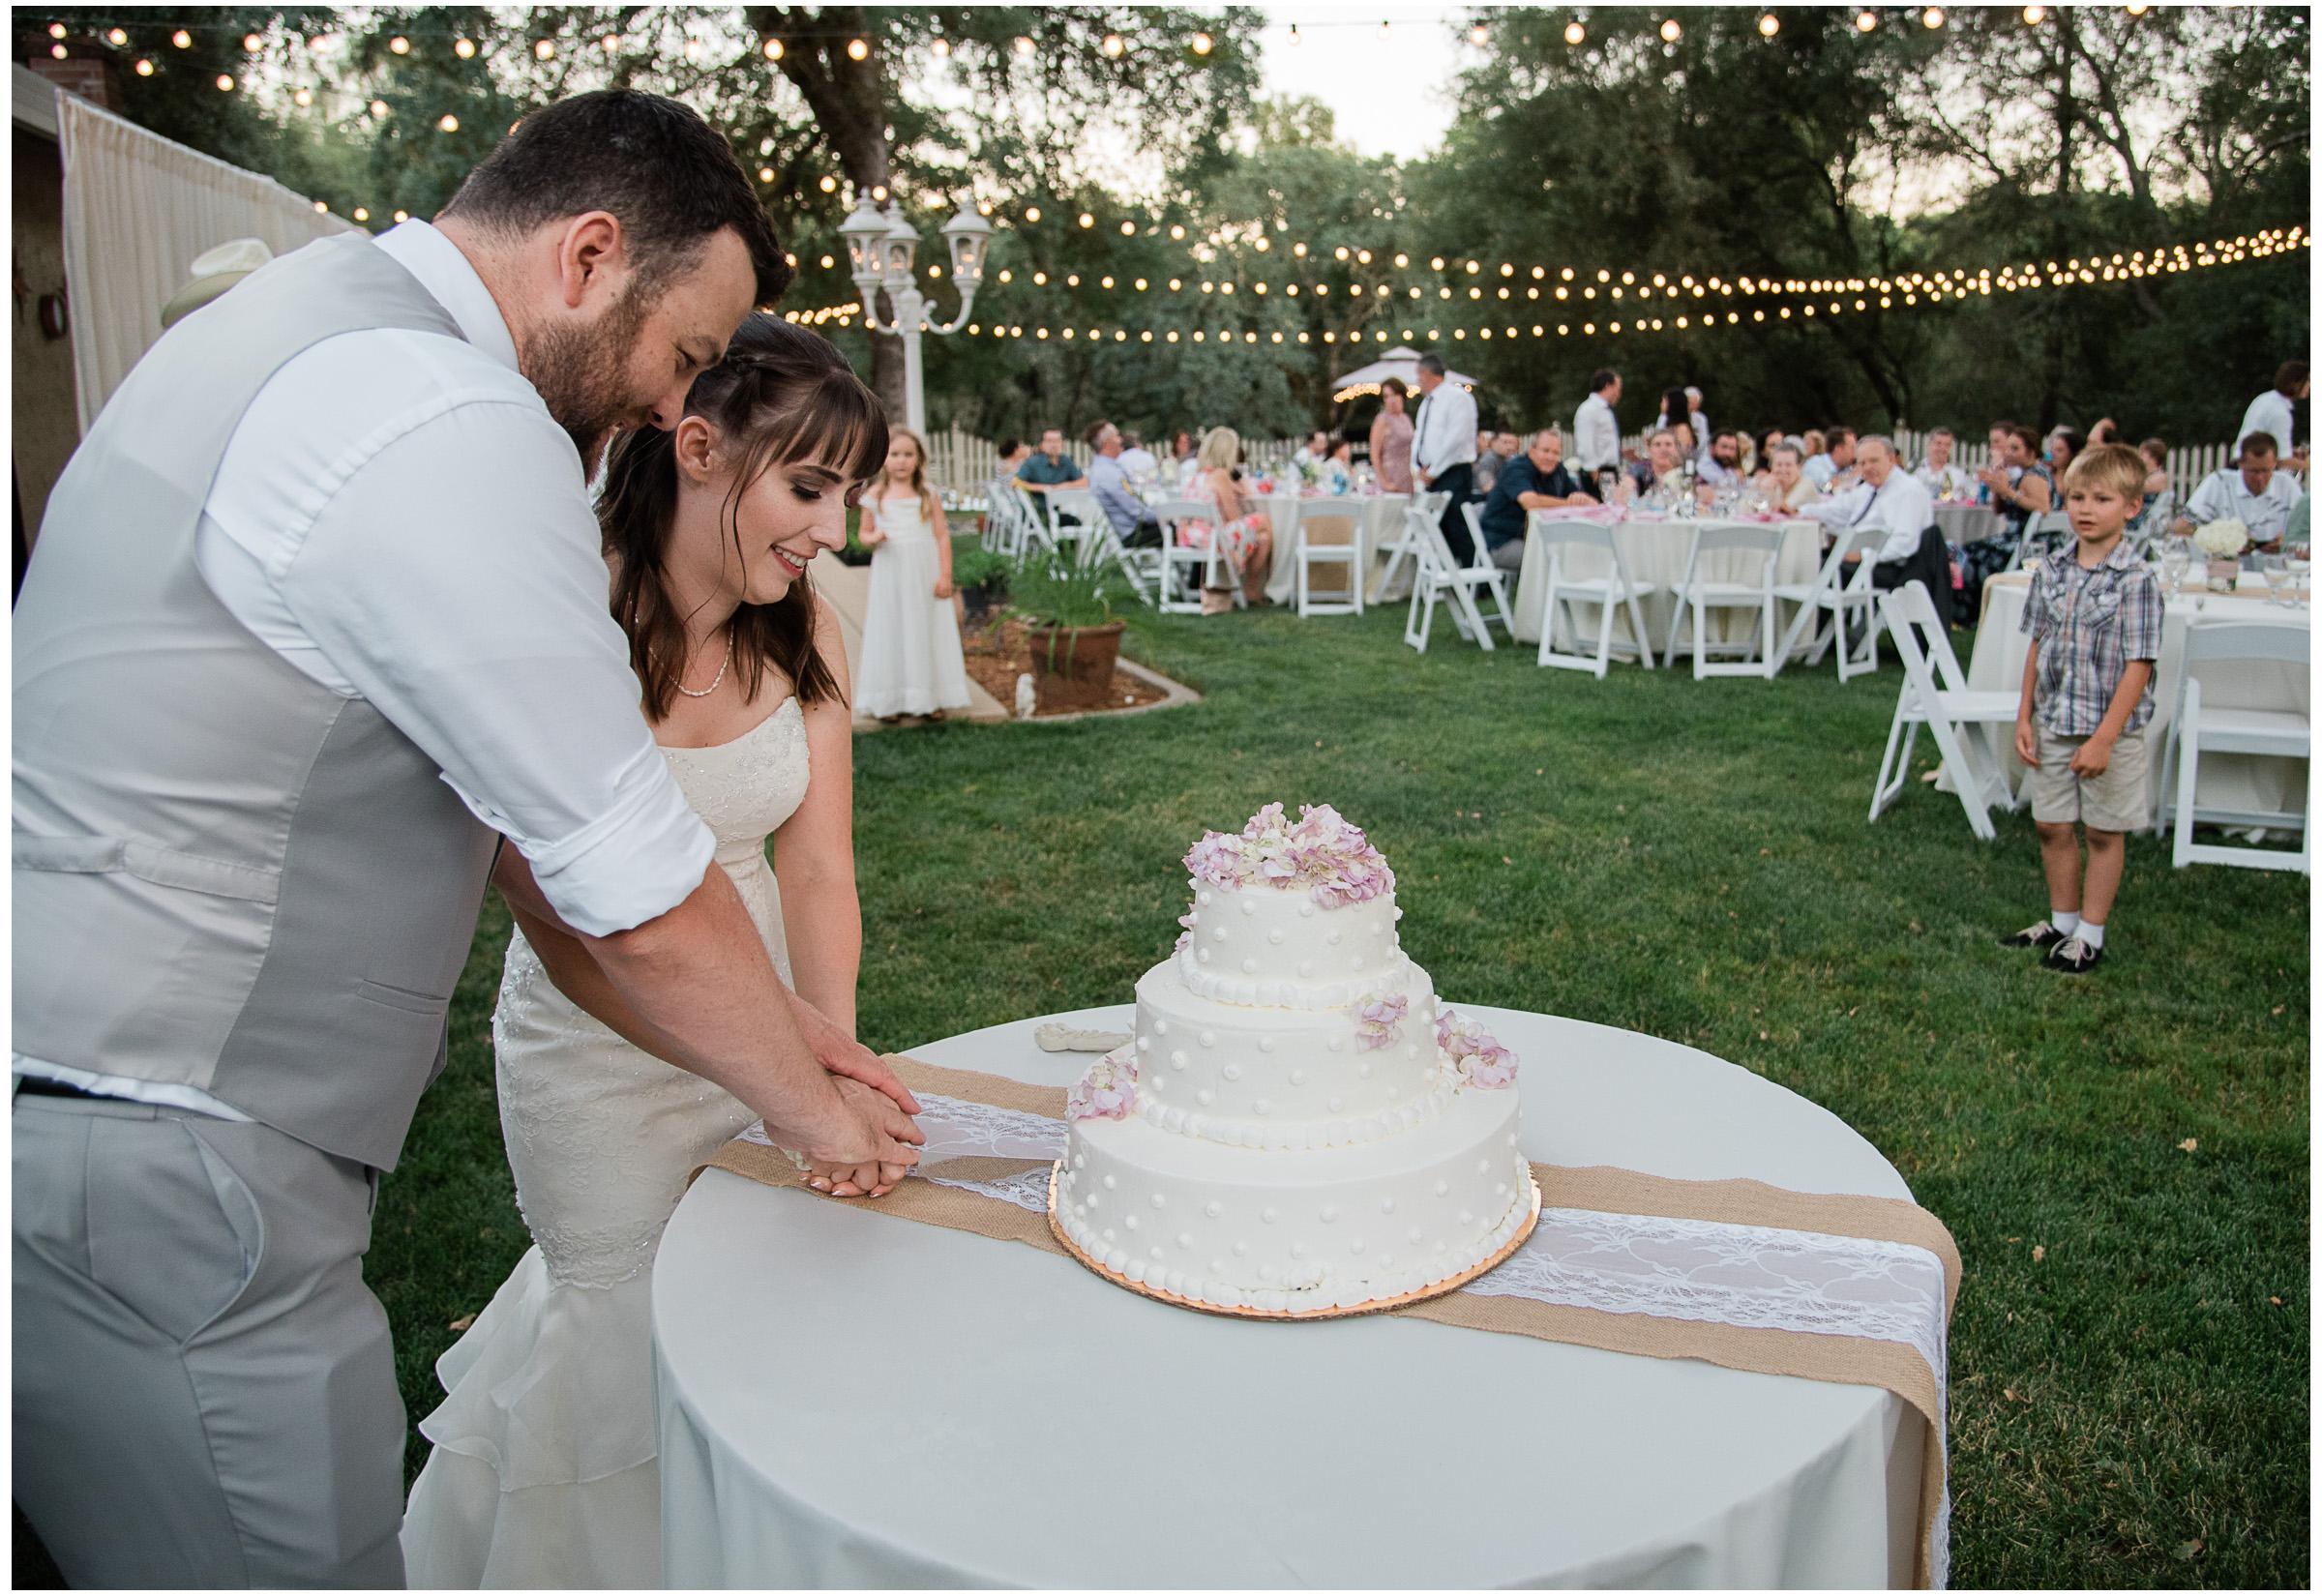 Placerville Wedding - Sacramento Photographer - Justin Wilcox Photography - 22.jpg